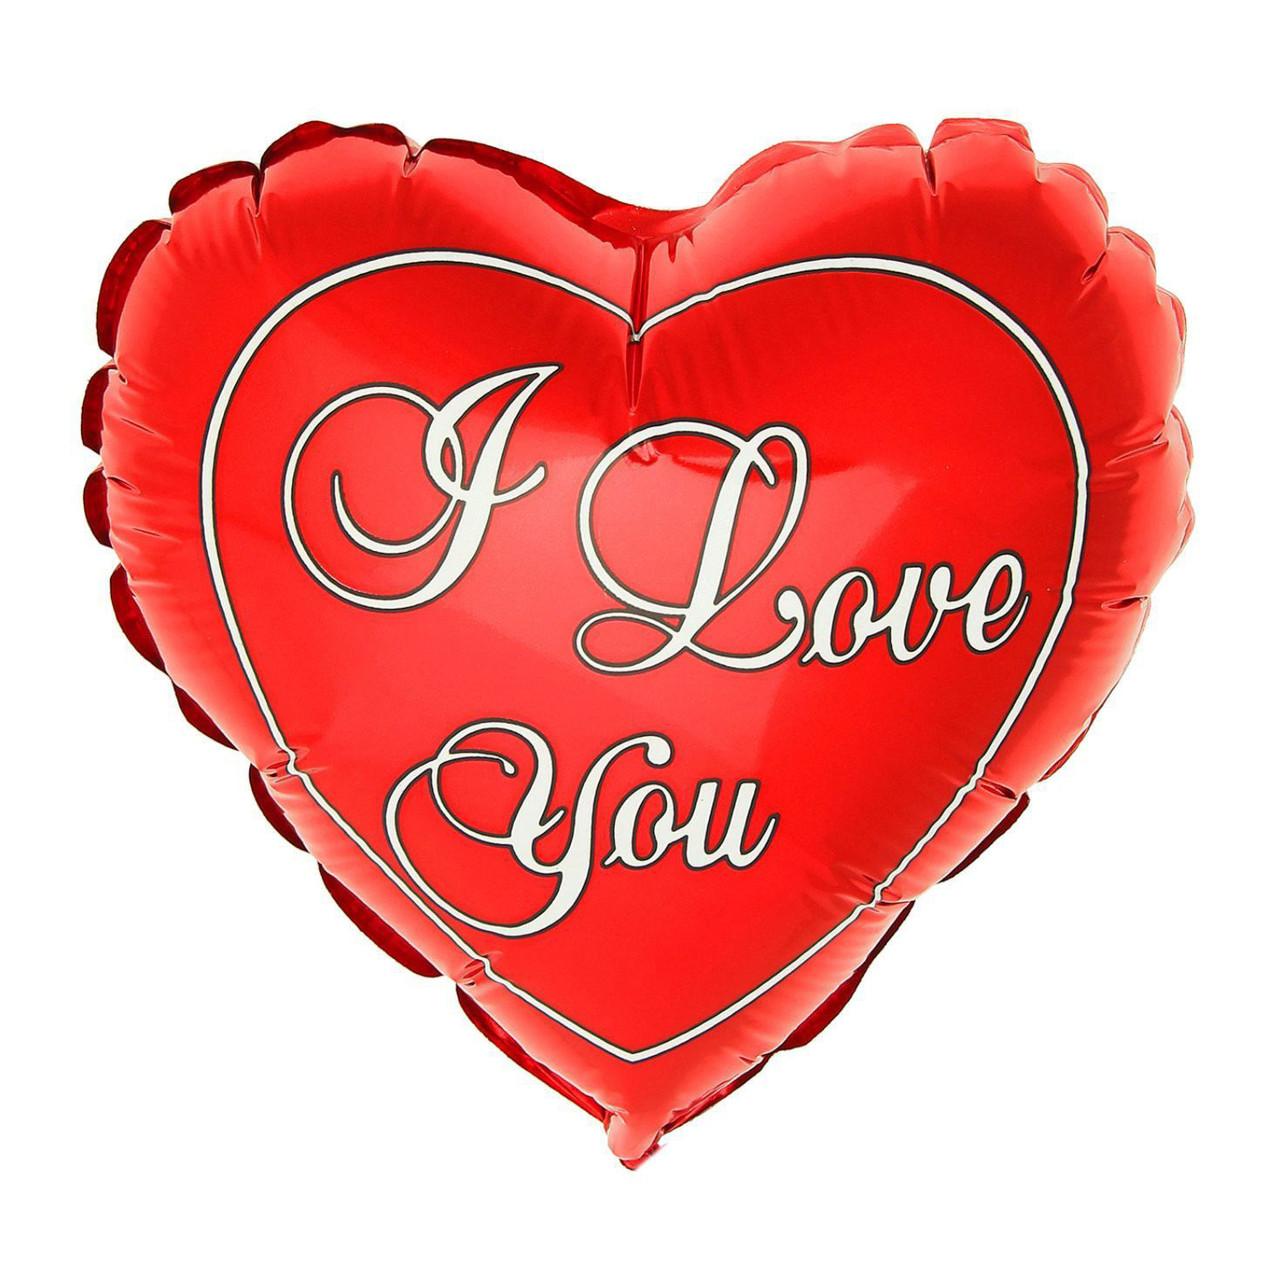 "Фол куля фігура 24"" (60 см) Серце Я люблю тебе I love you (ФМ)"